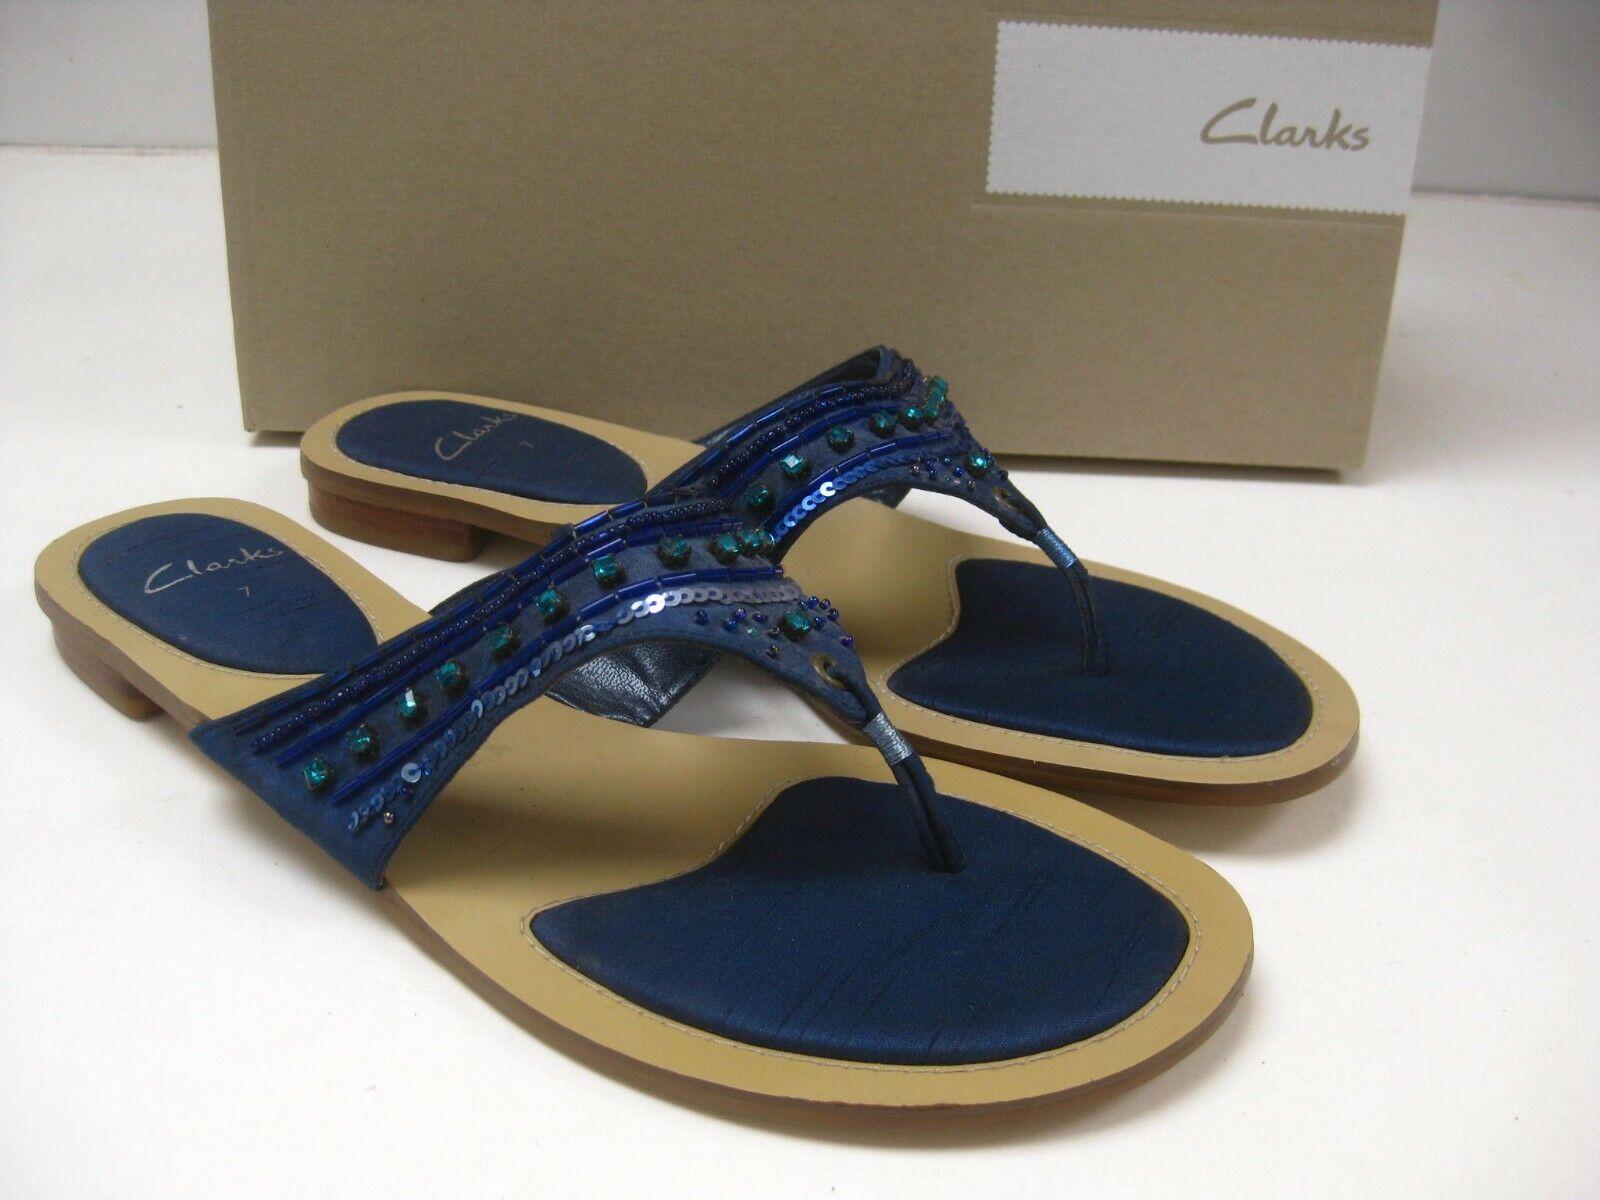 Ladies CLARKS bluee SANDALS 7 41 mules beach flats toe posts sequins boho hippy